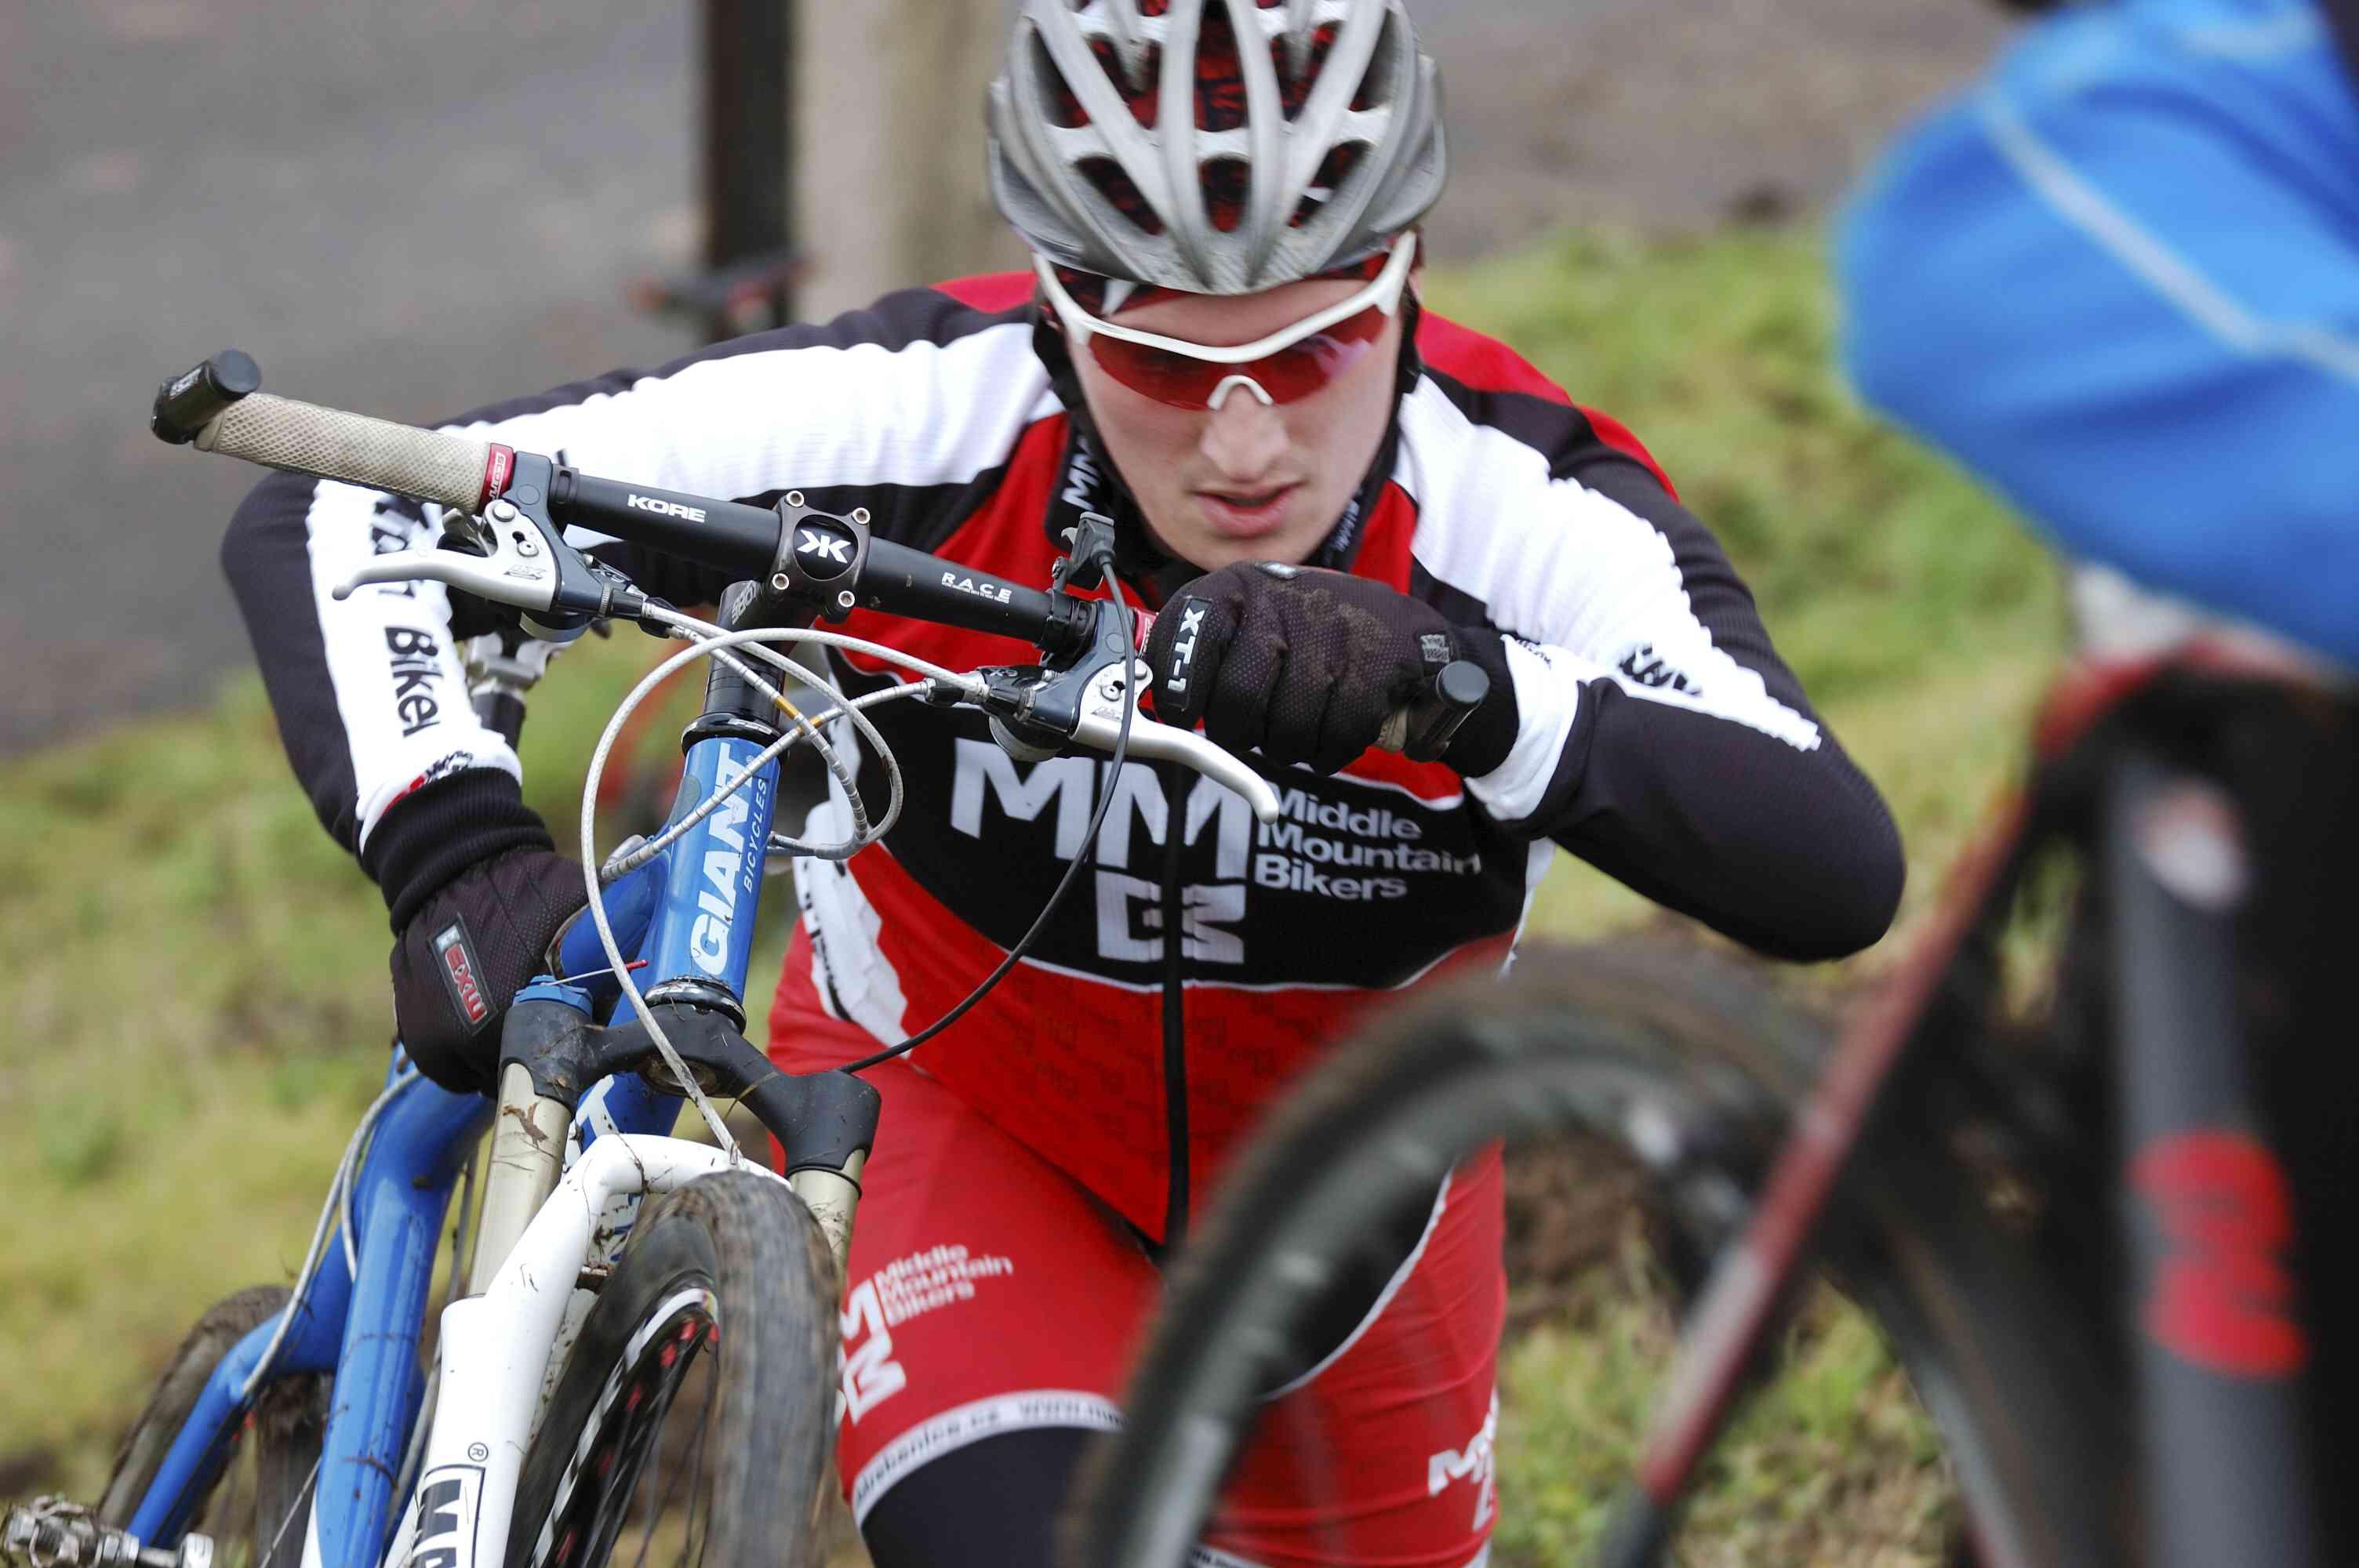 Silvestrovský cyklokros Terezín 2011